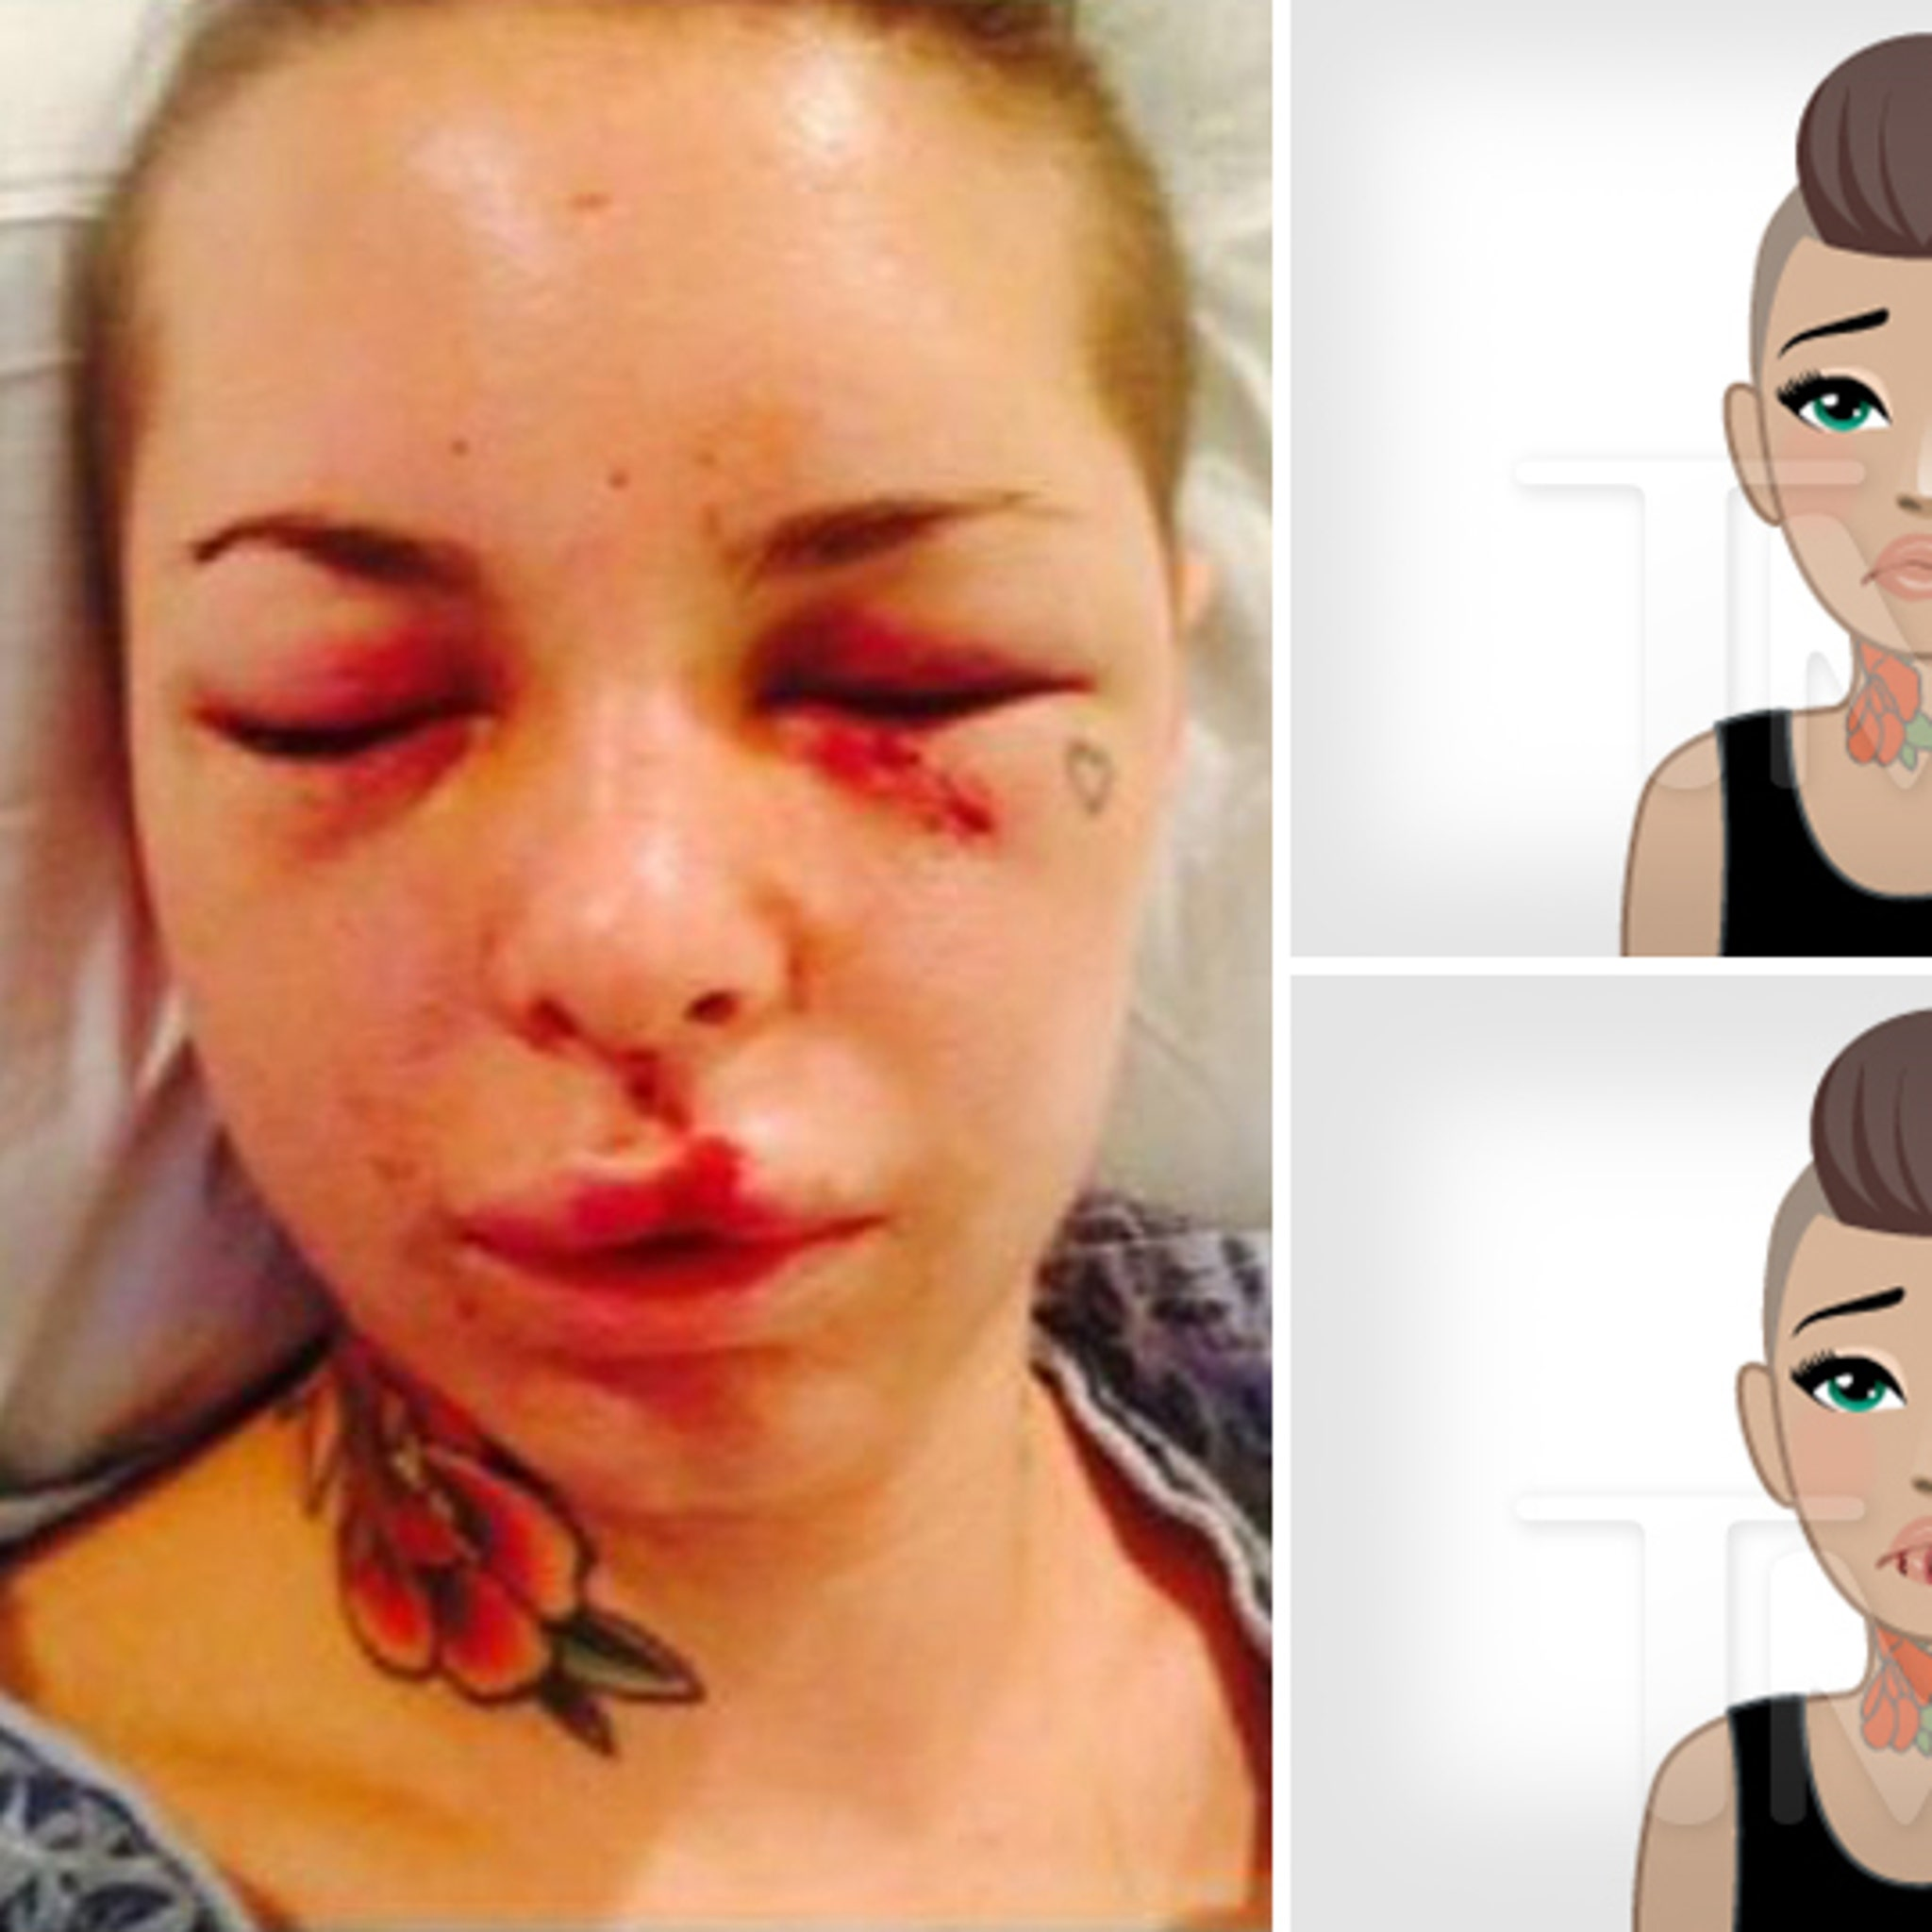 Christy Mack Porn Pics porn star christy mack: creates domestic violence emojis